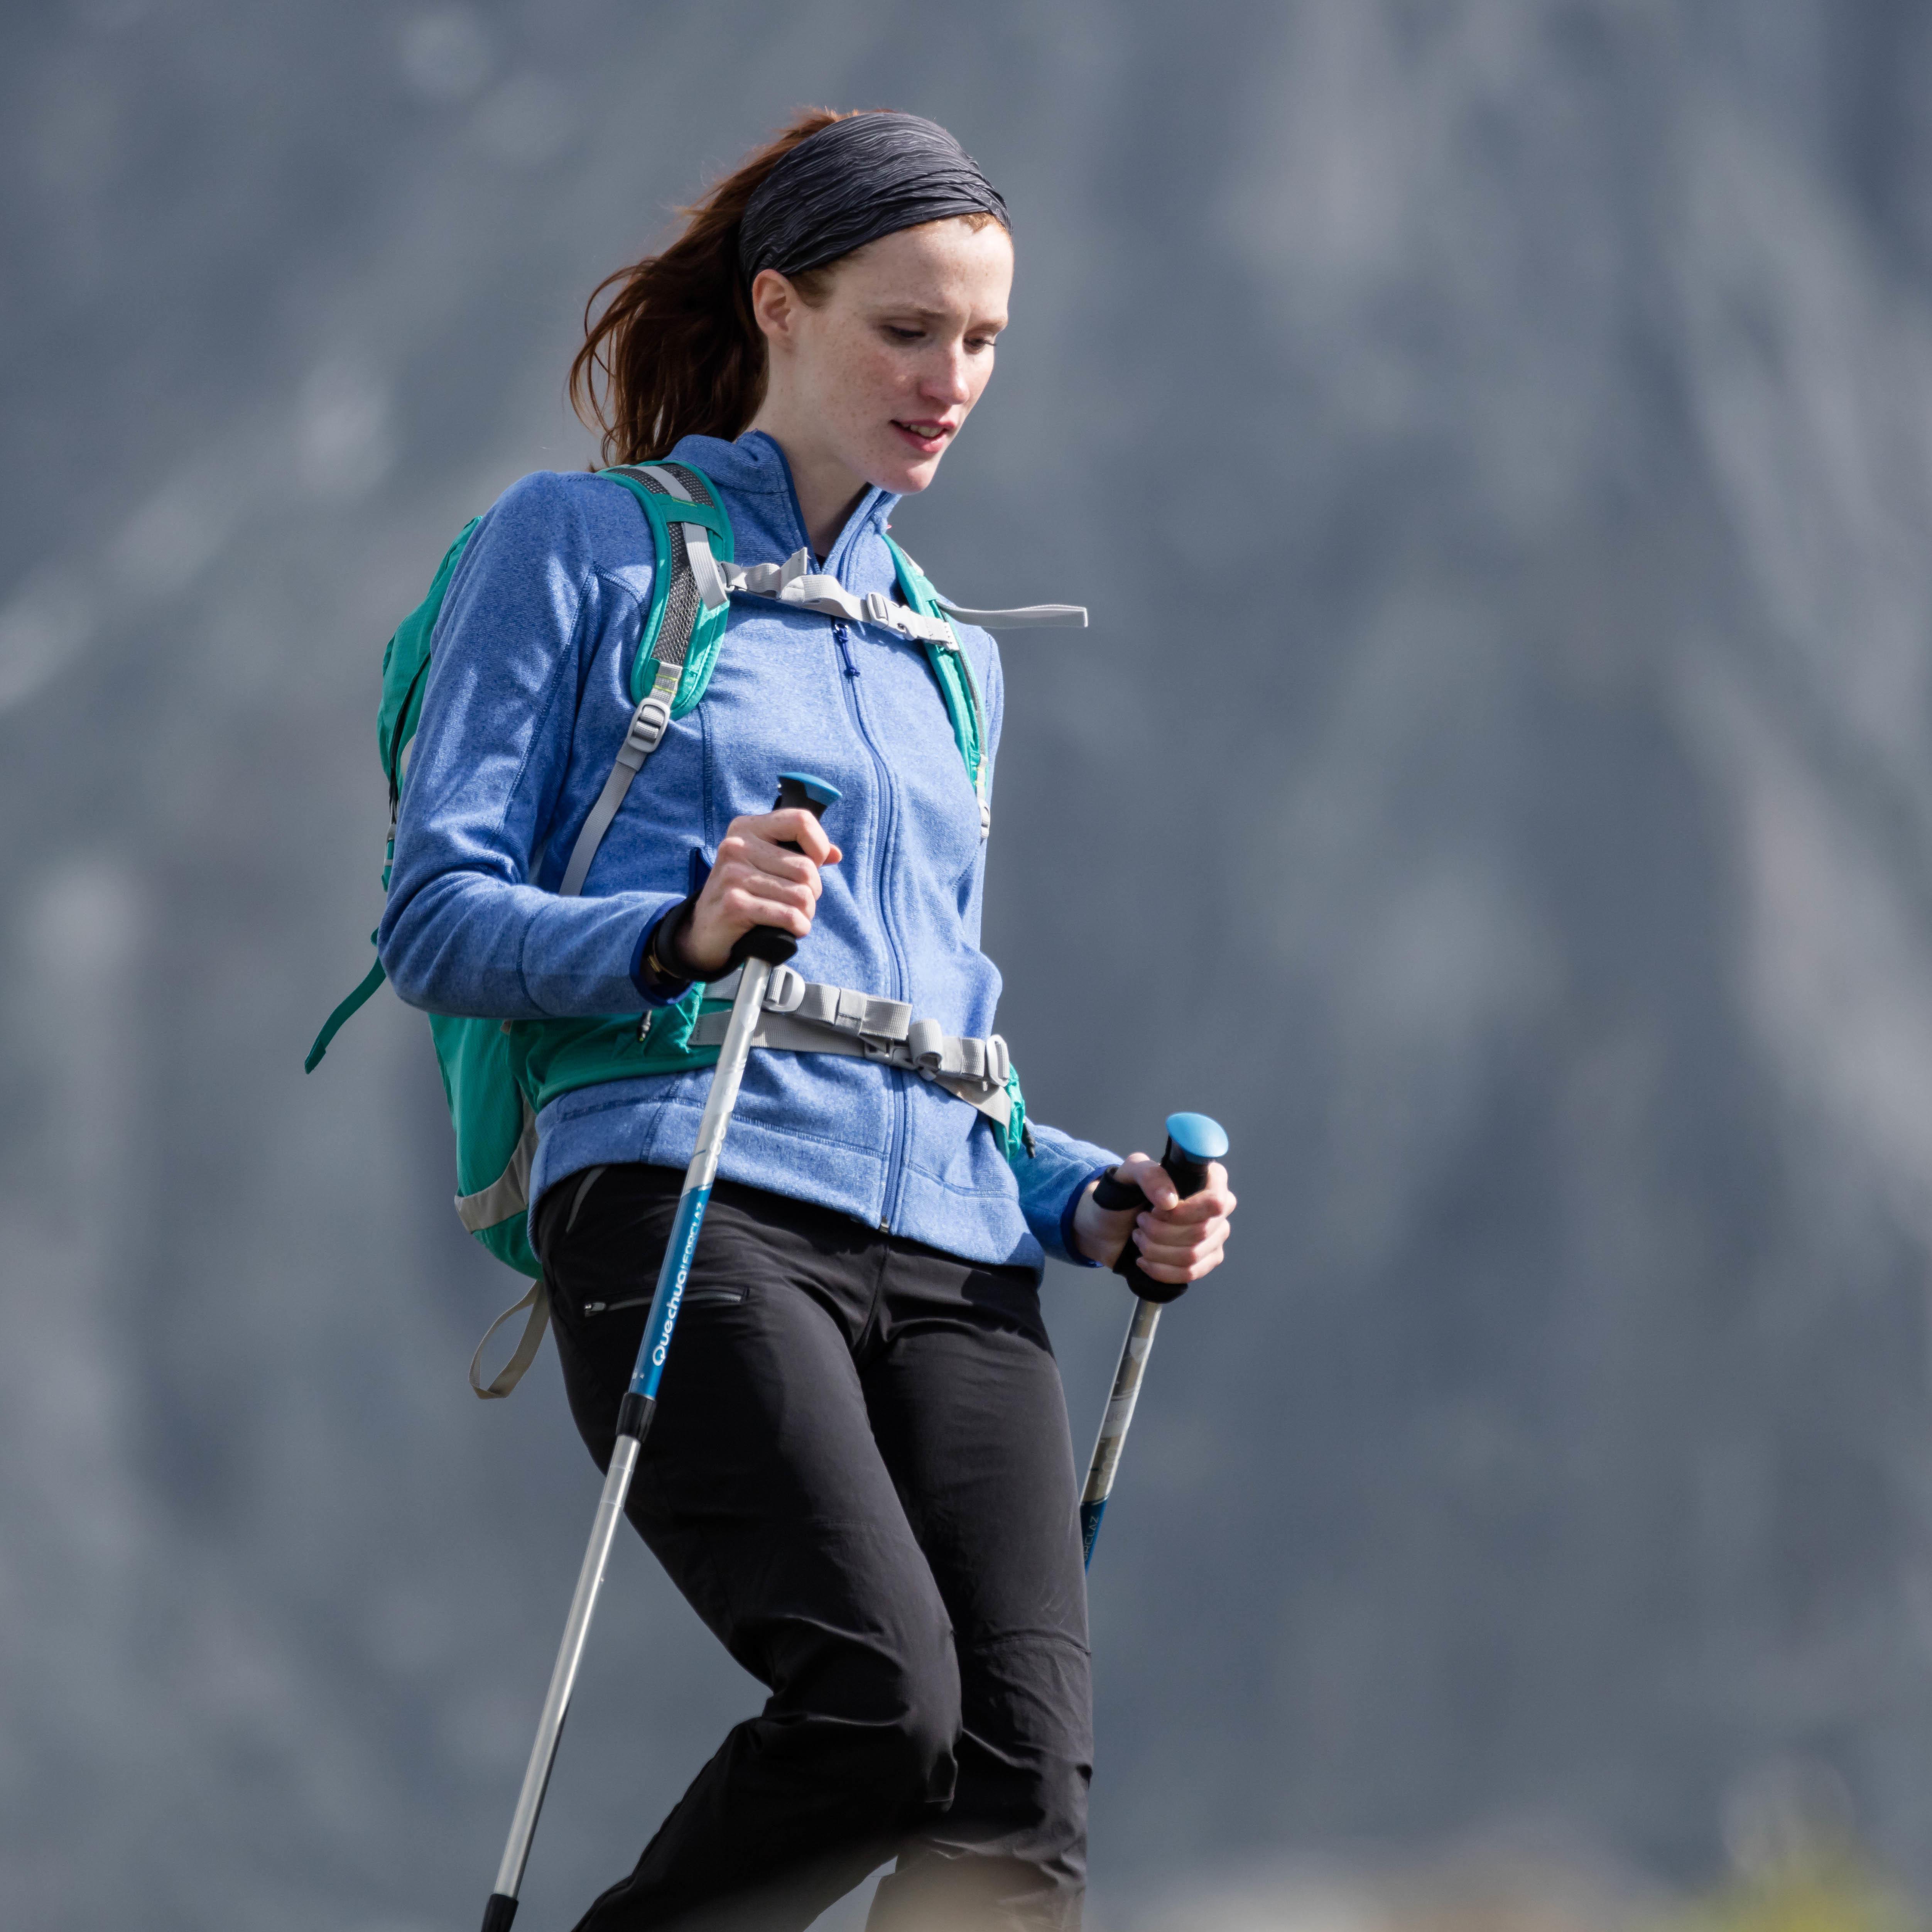 Women's Mountain Hiking Fleece Jacket MH120 - Flame Green